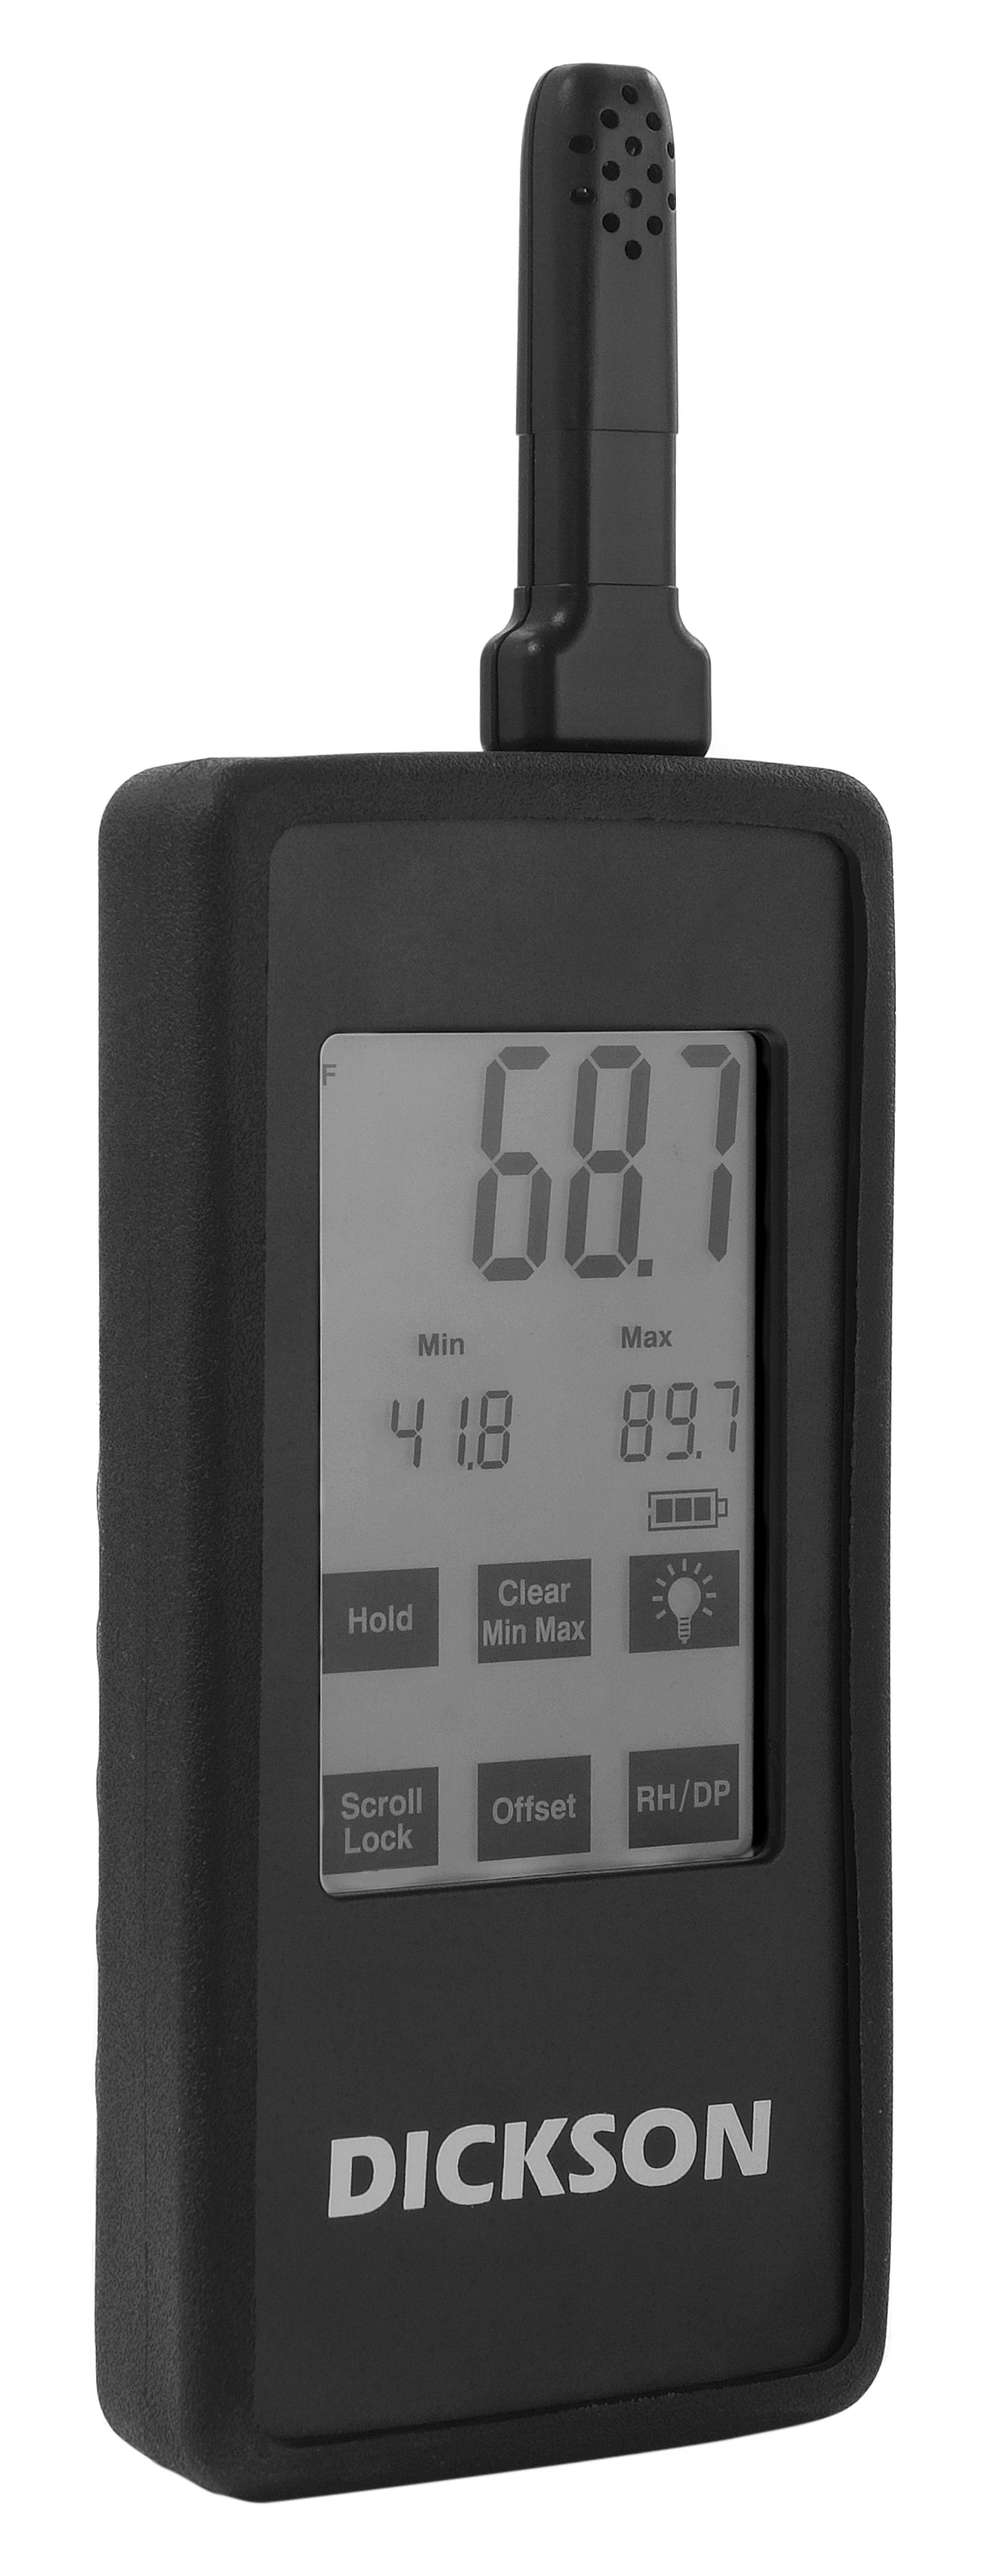 Th700 indicator angle 2 w probe 12254